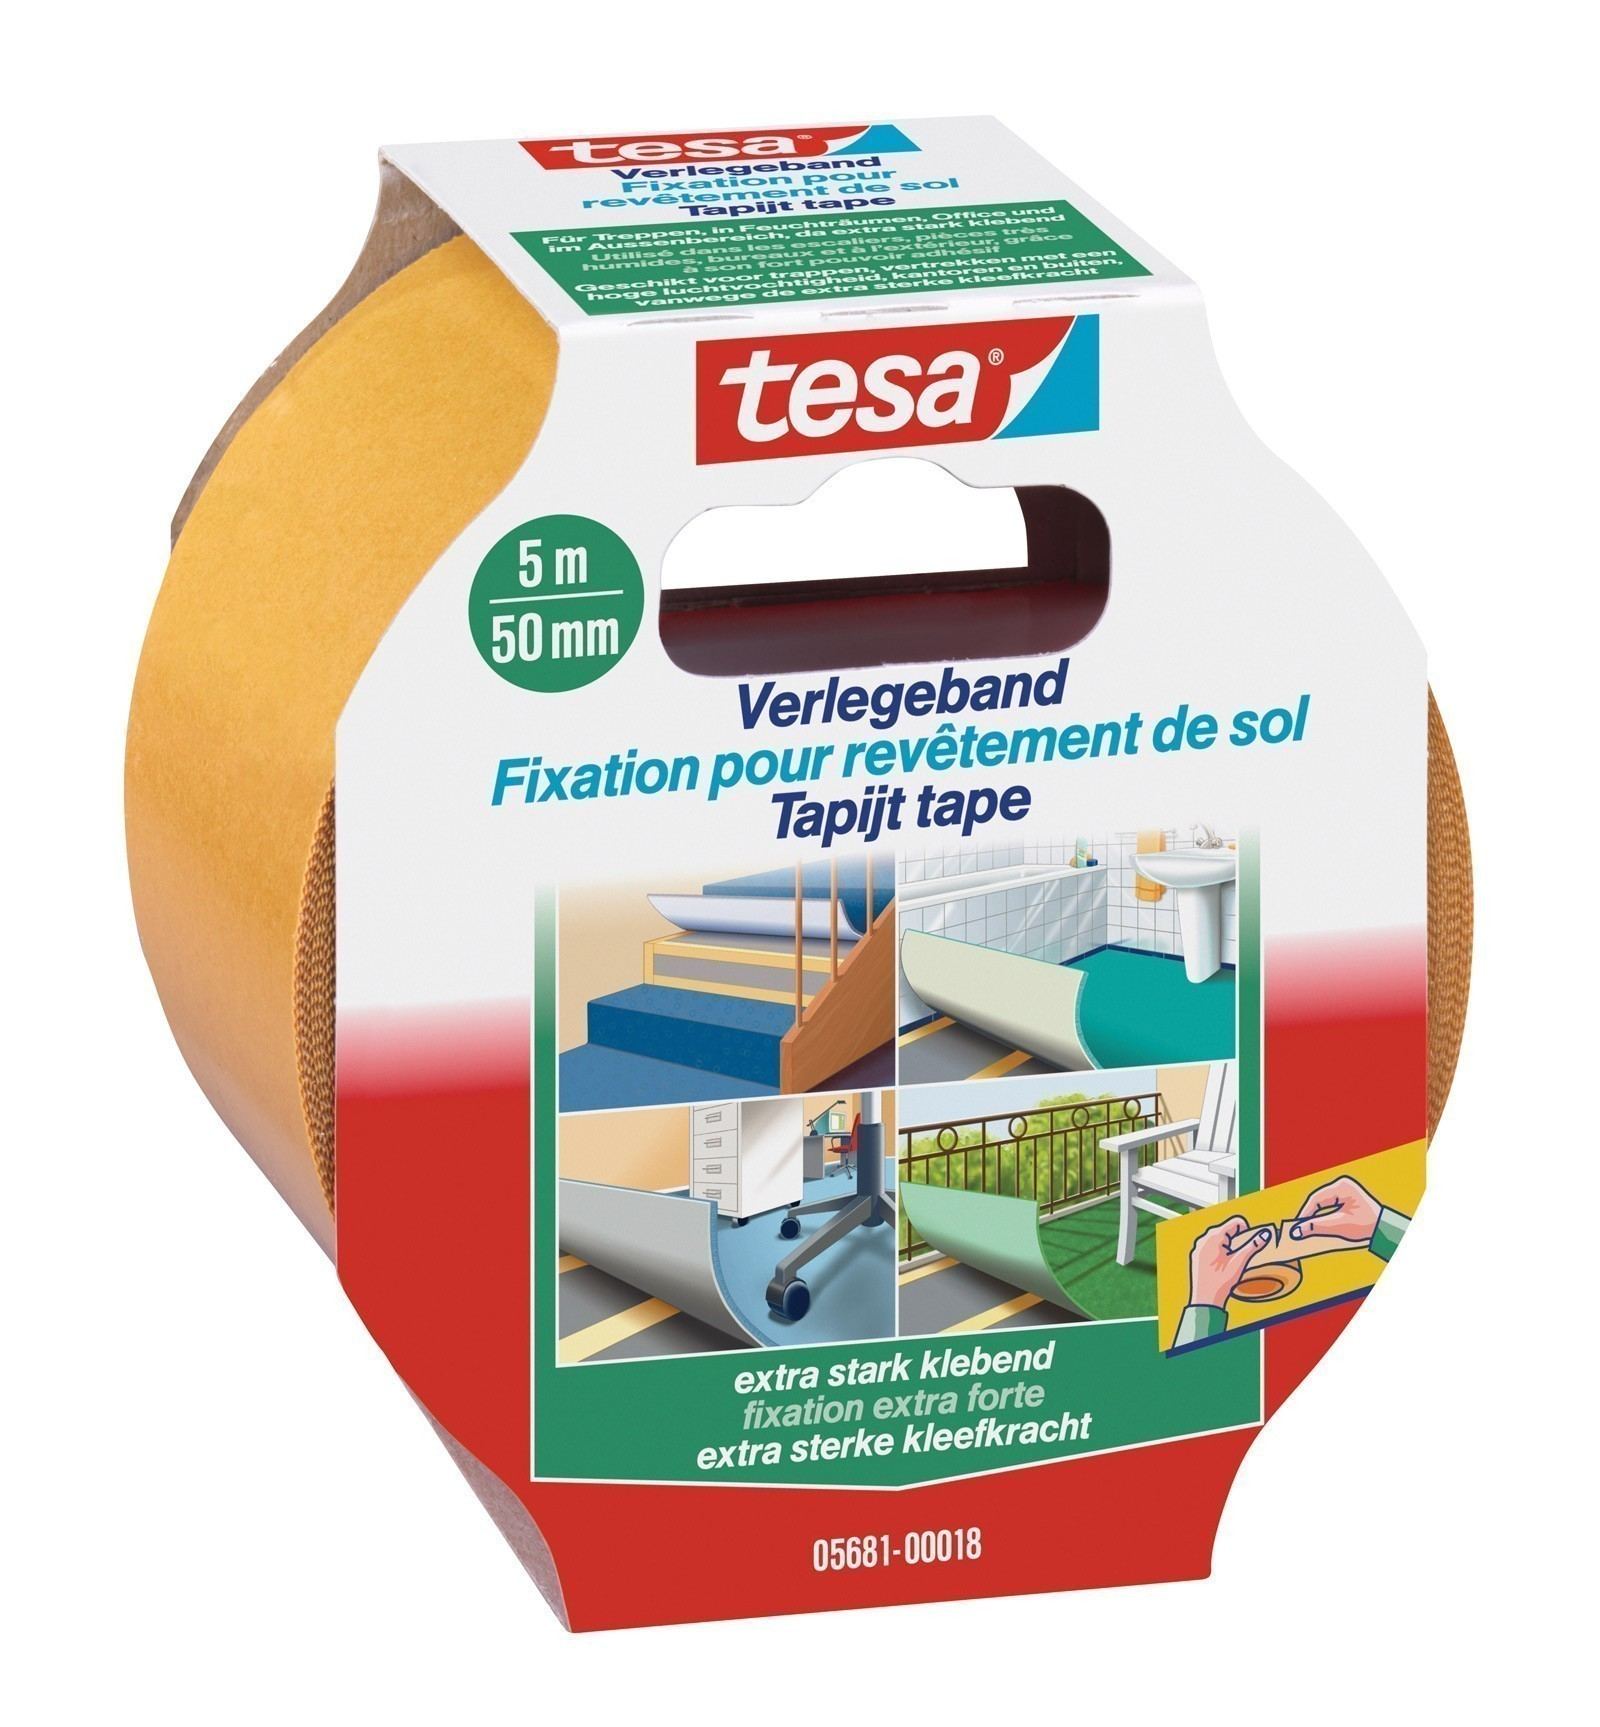 tesa® Verlegeband extra stark klebend 5 m x 50 mm Bild 1